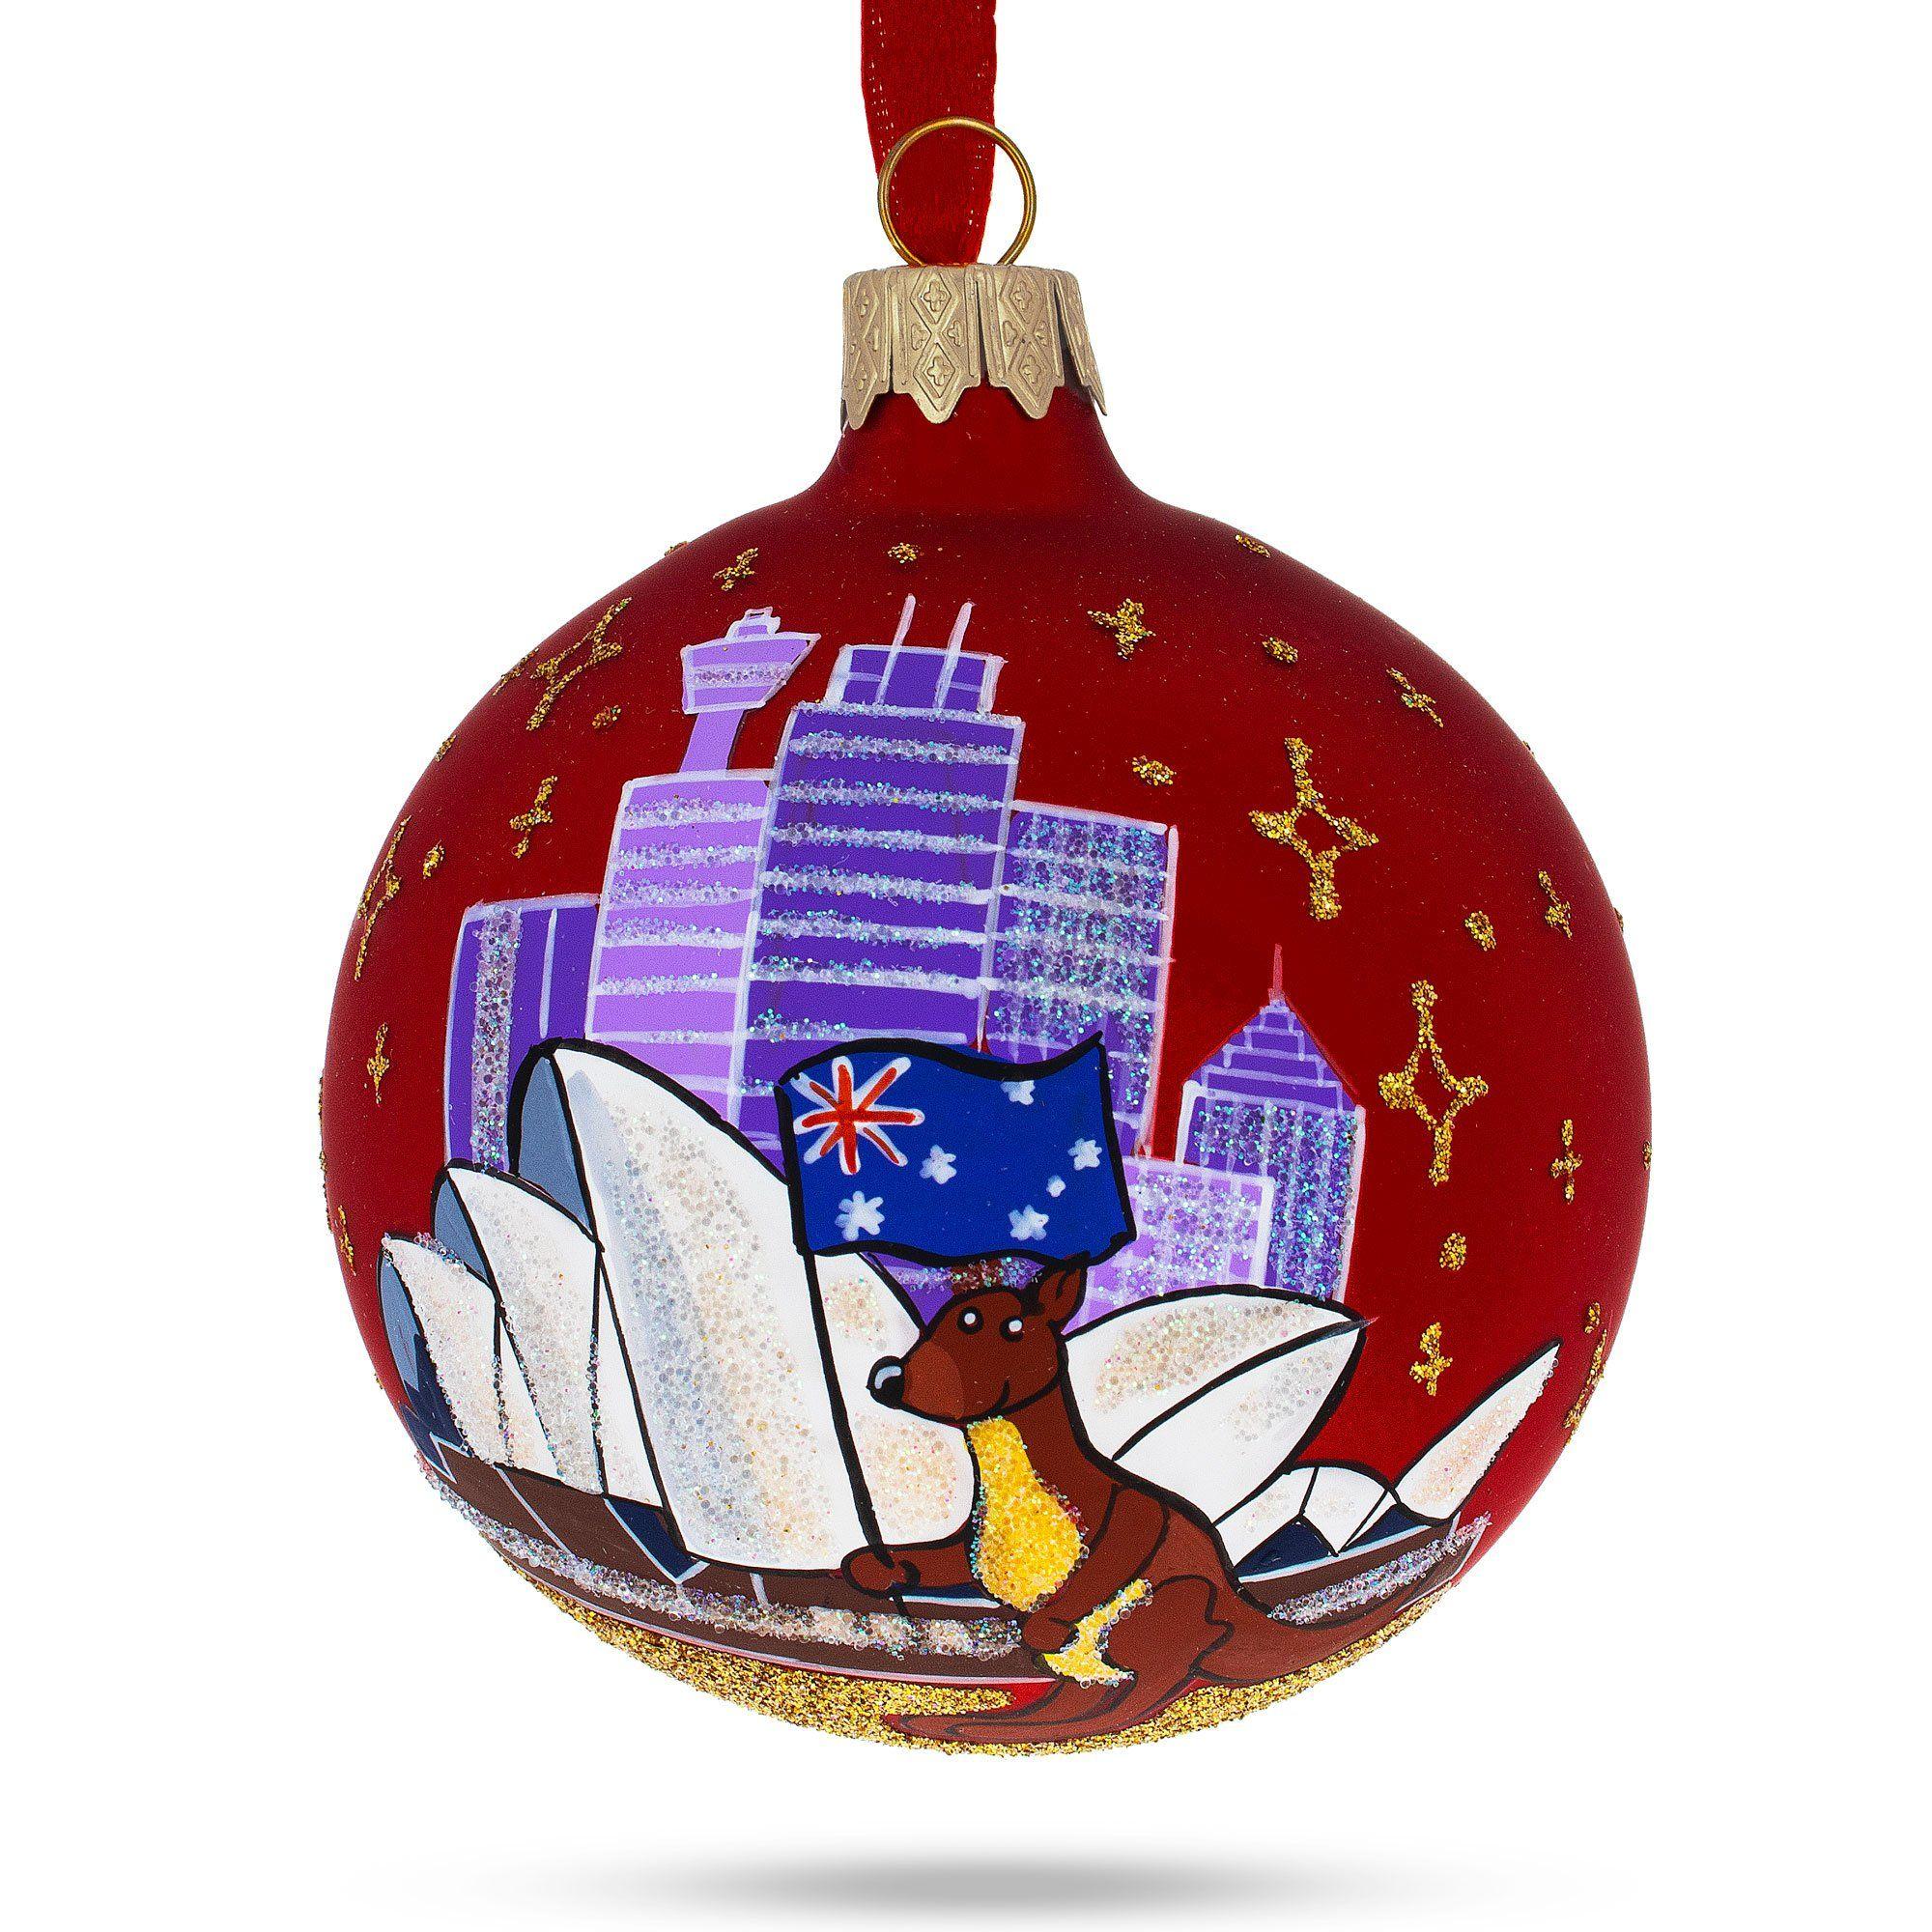 Sydney Opera House Australia Glass Christmas Ornament Glass Christmas Ornaments Christmas Ornaments Gift Box Design